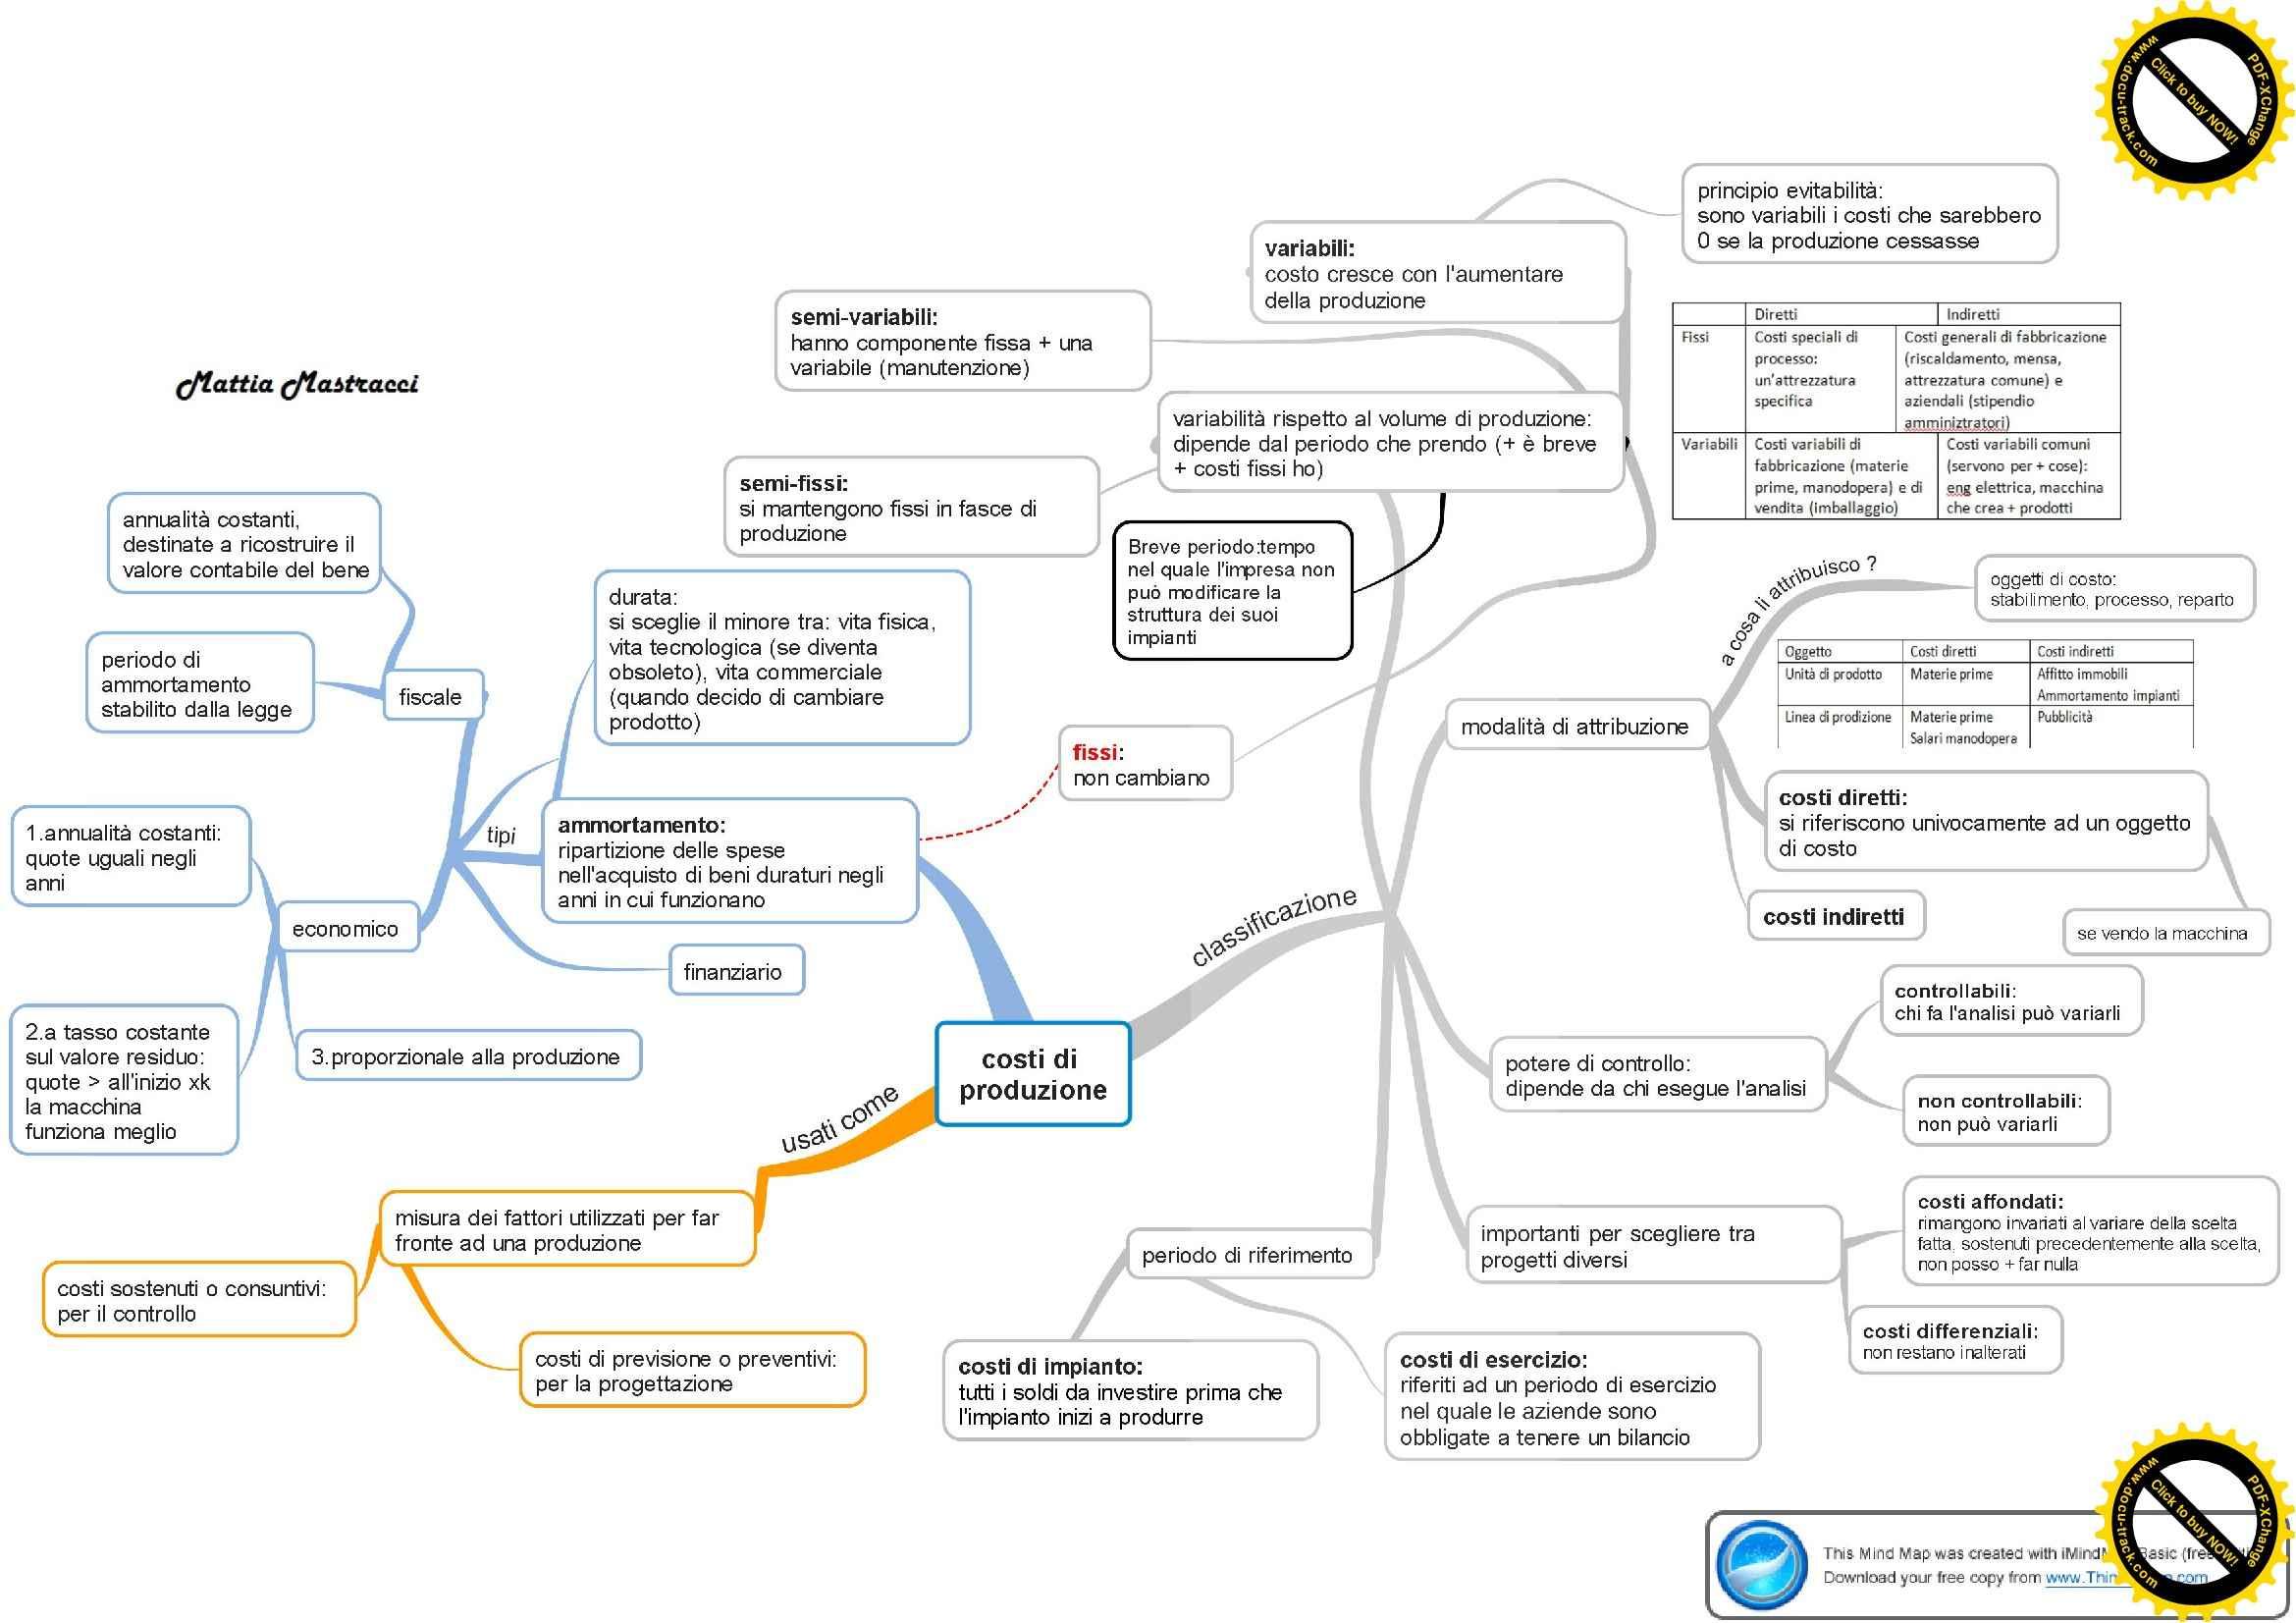 Impianti industriali - Mappe mentali